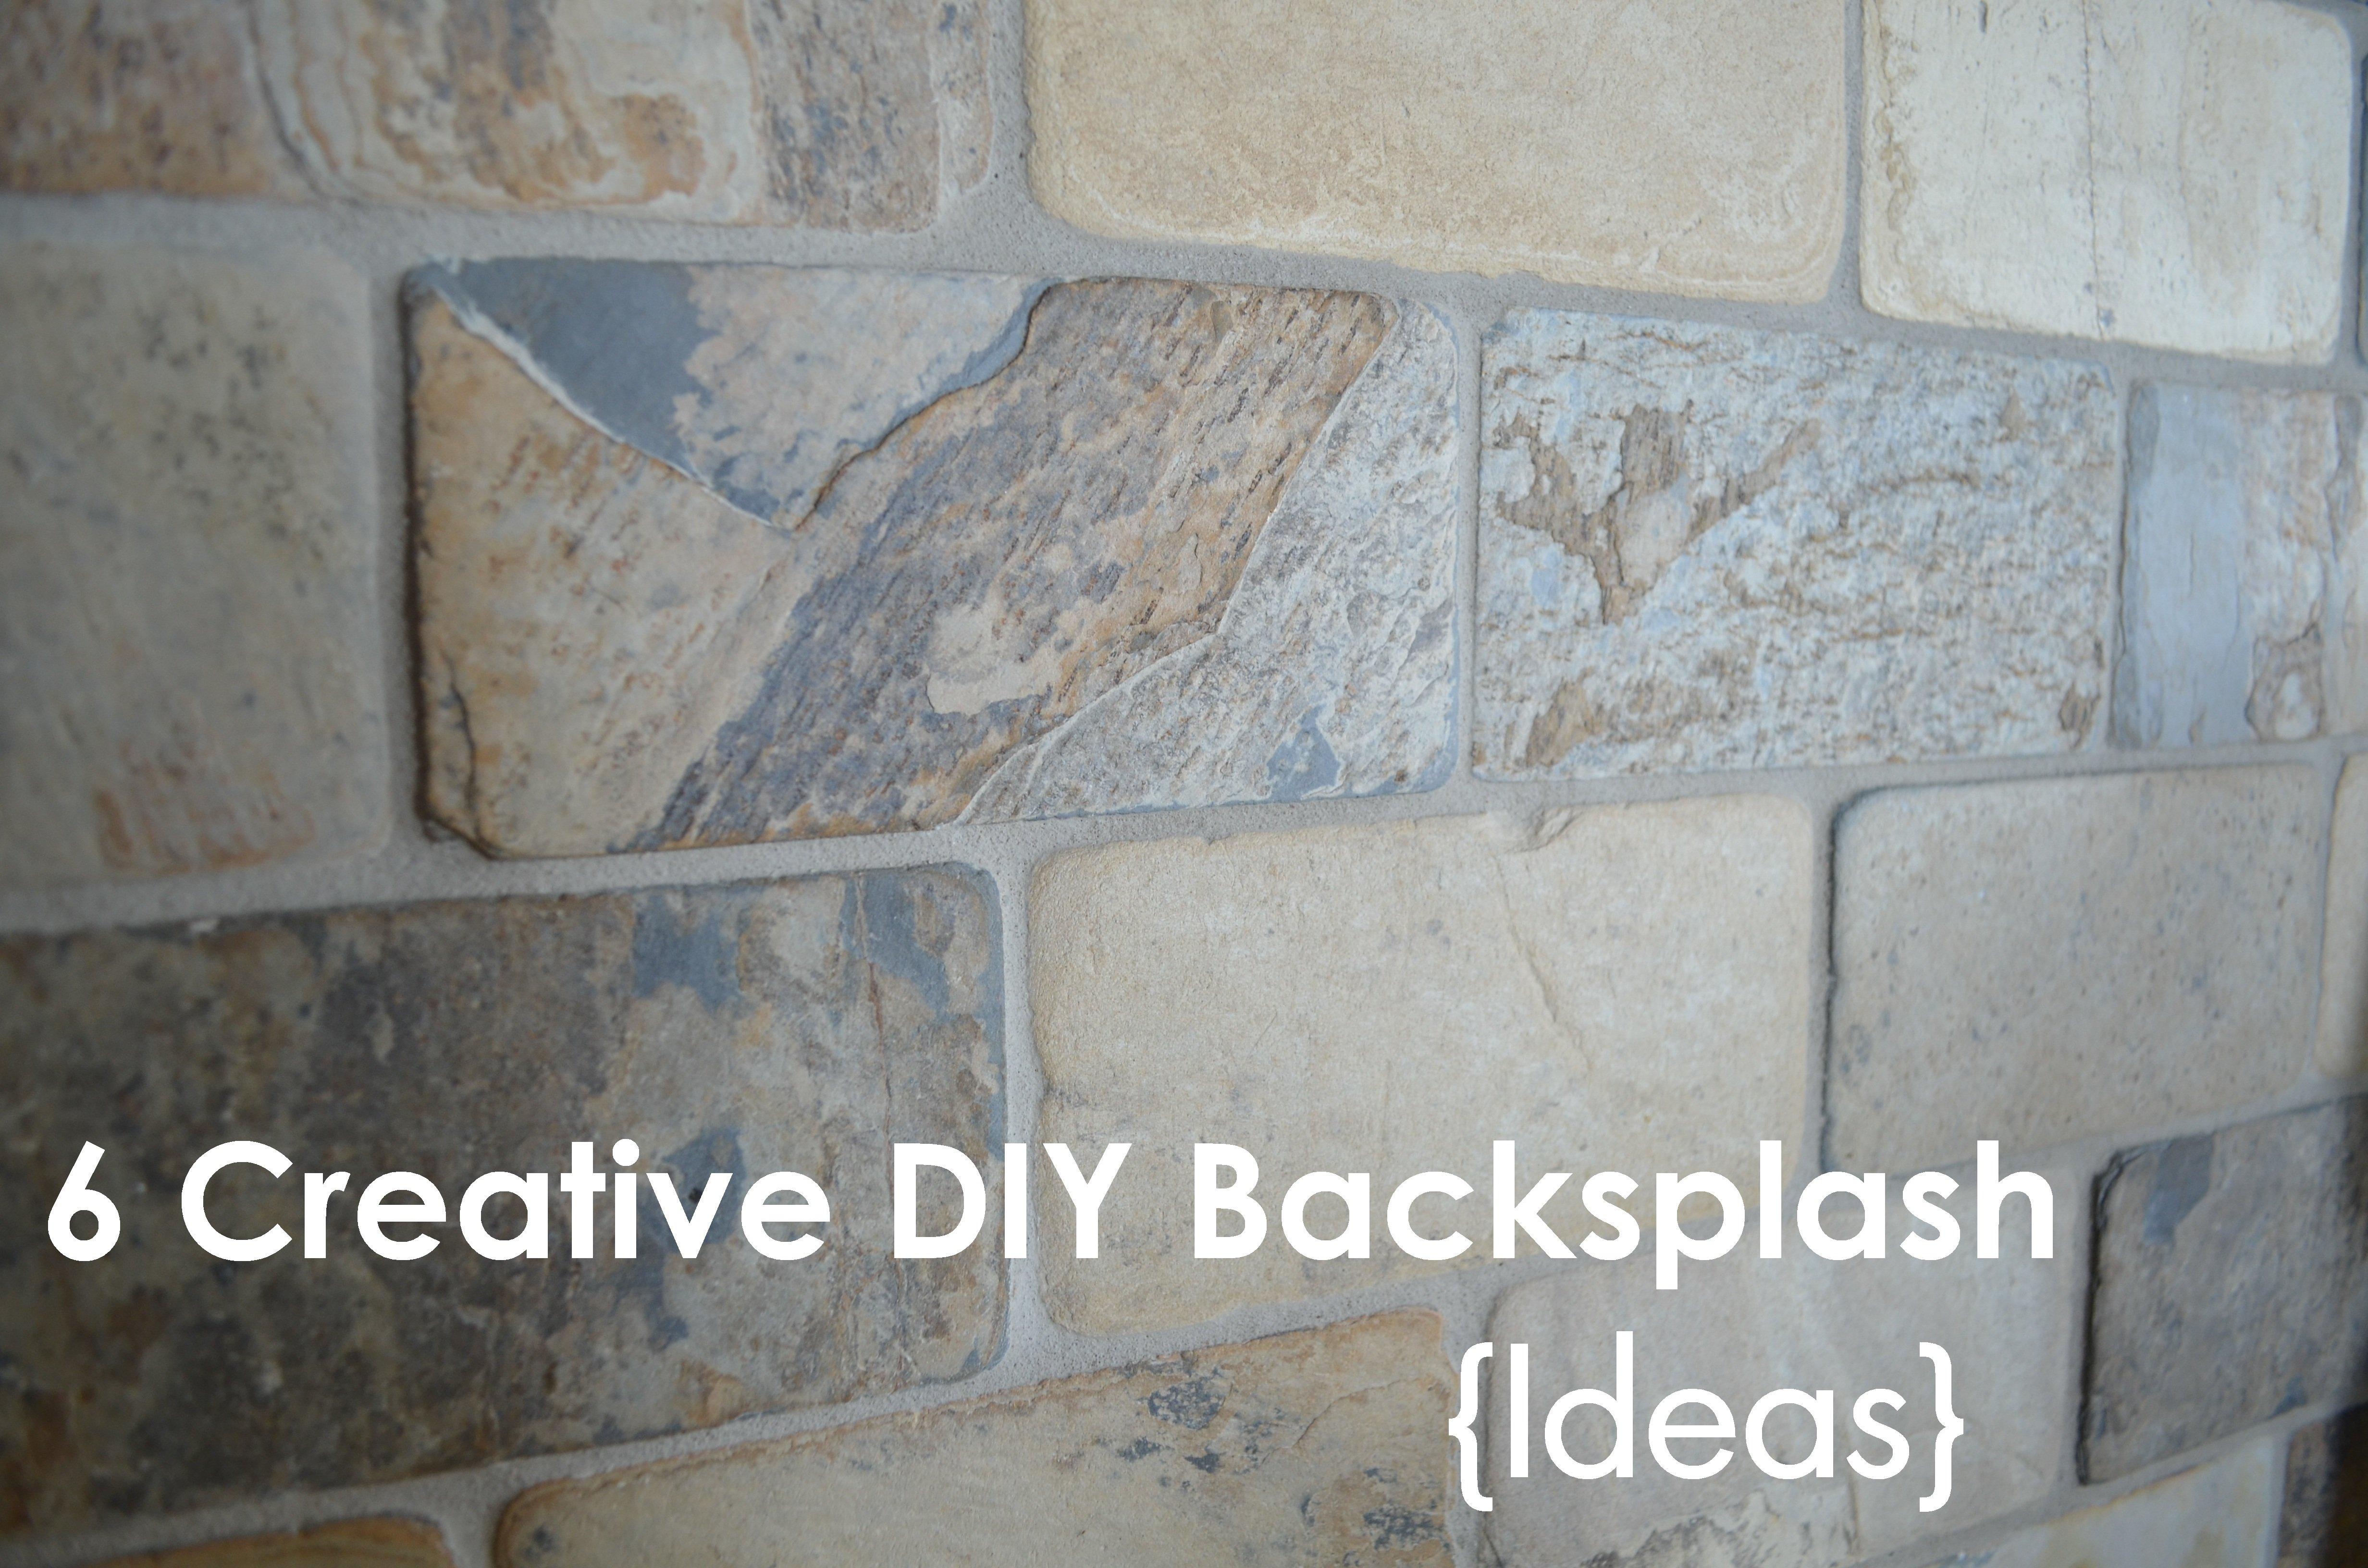 Wallpaper as a backsplash wallpapersafari for Vinyl wallpaper backsplash